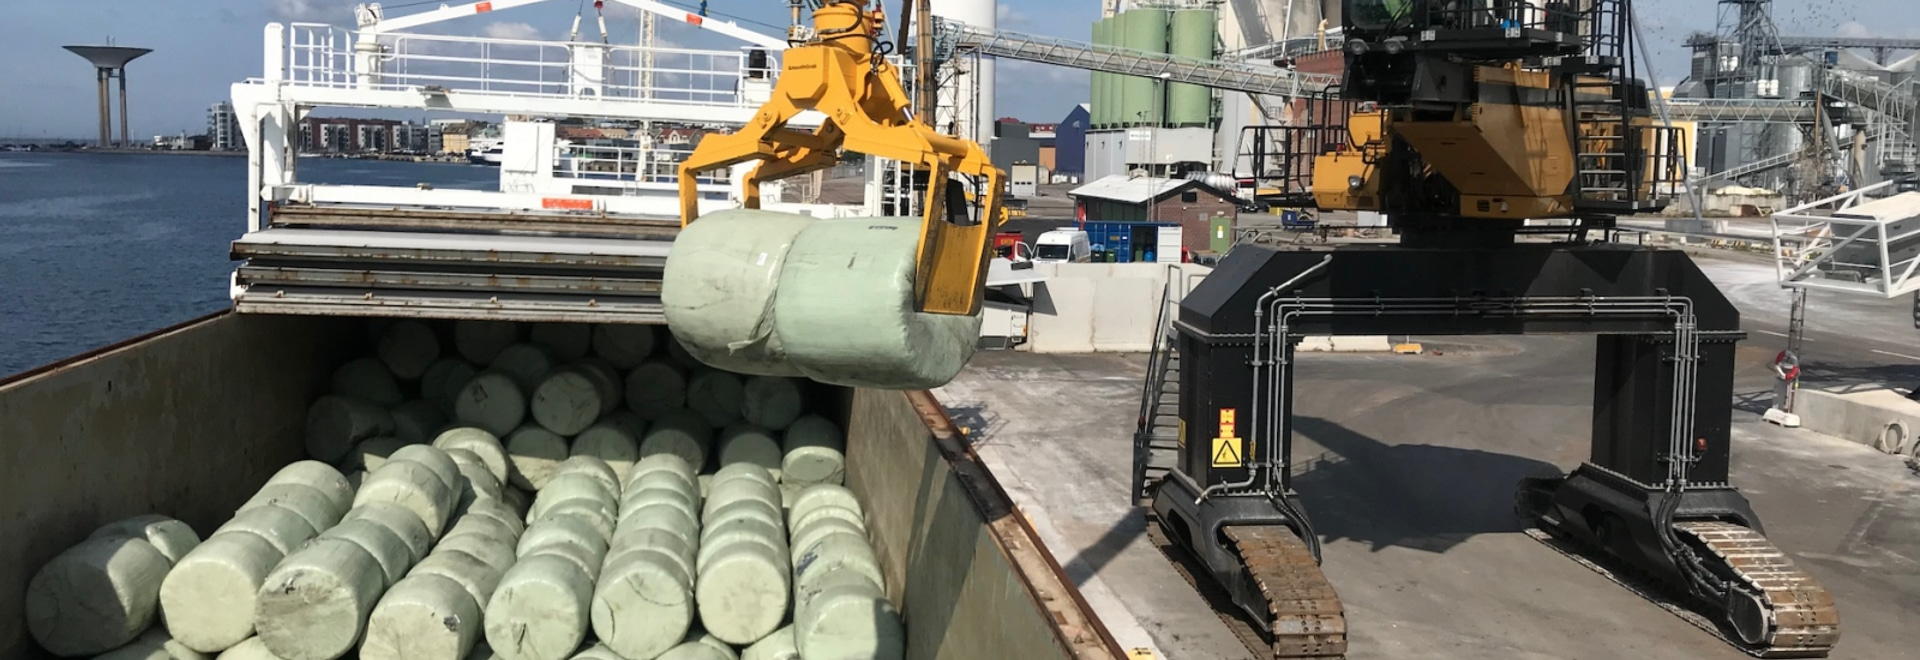 Geminor Begins Bulk RDF Shipments to Swedish Waste to Energy Plant